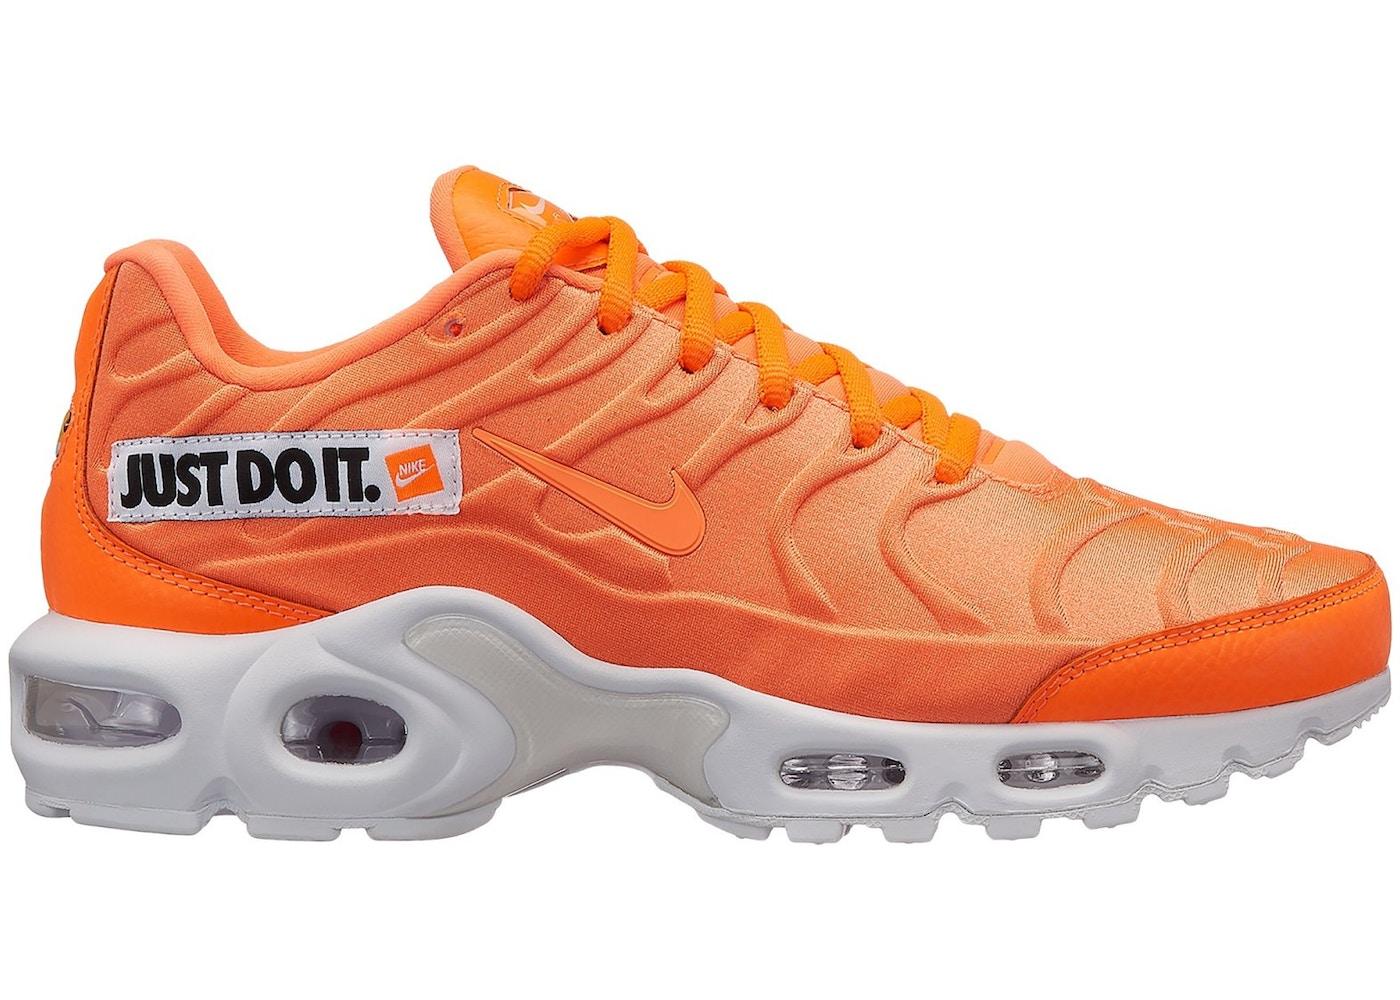 Nike Air Max Plus Just Do It Pack Orange (W)